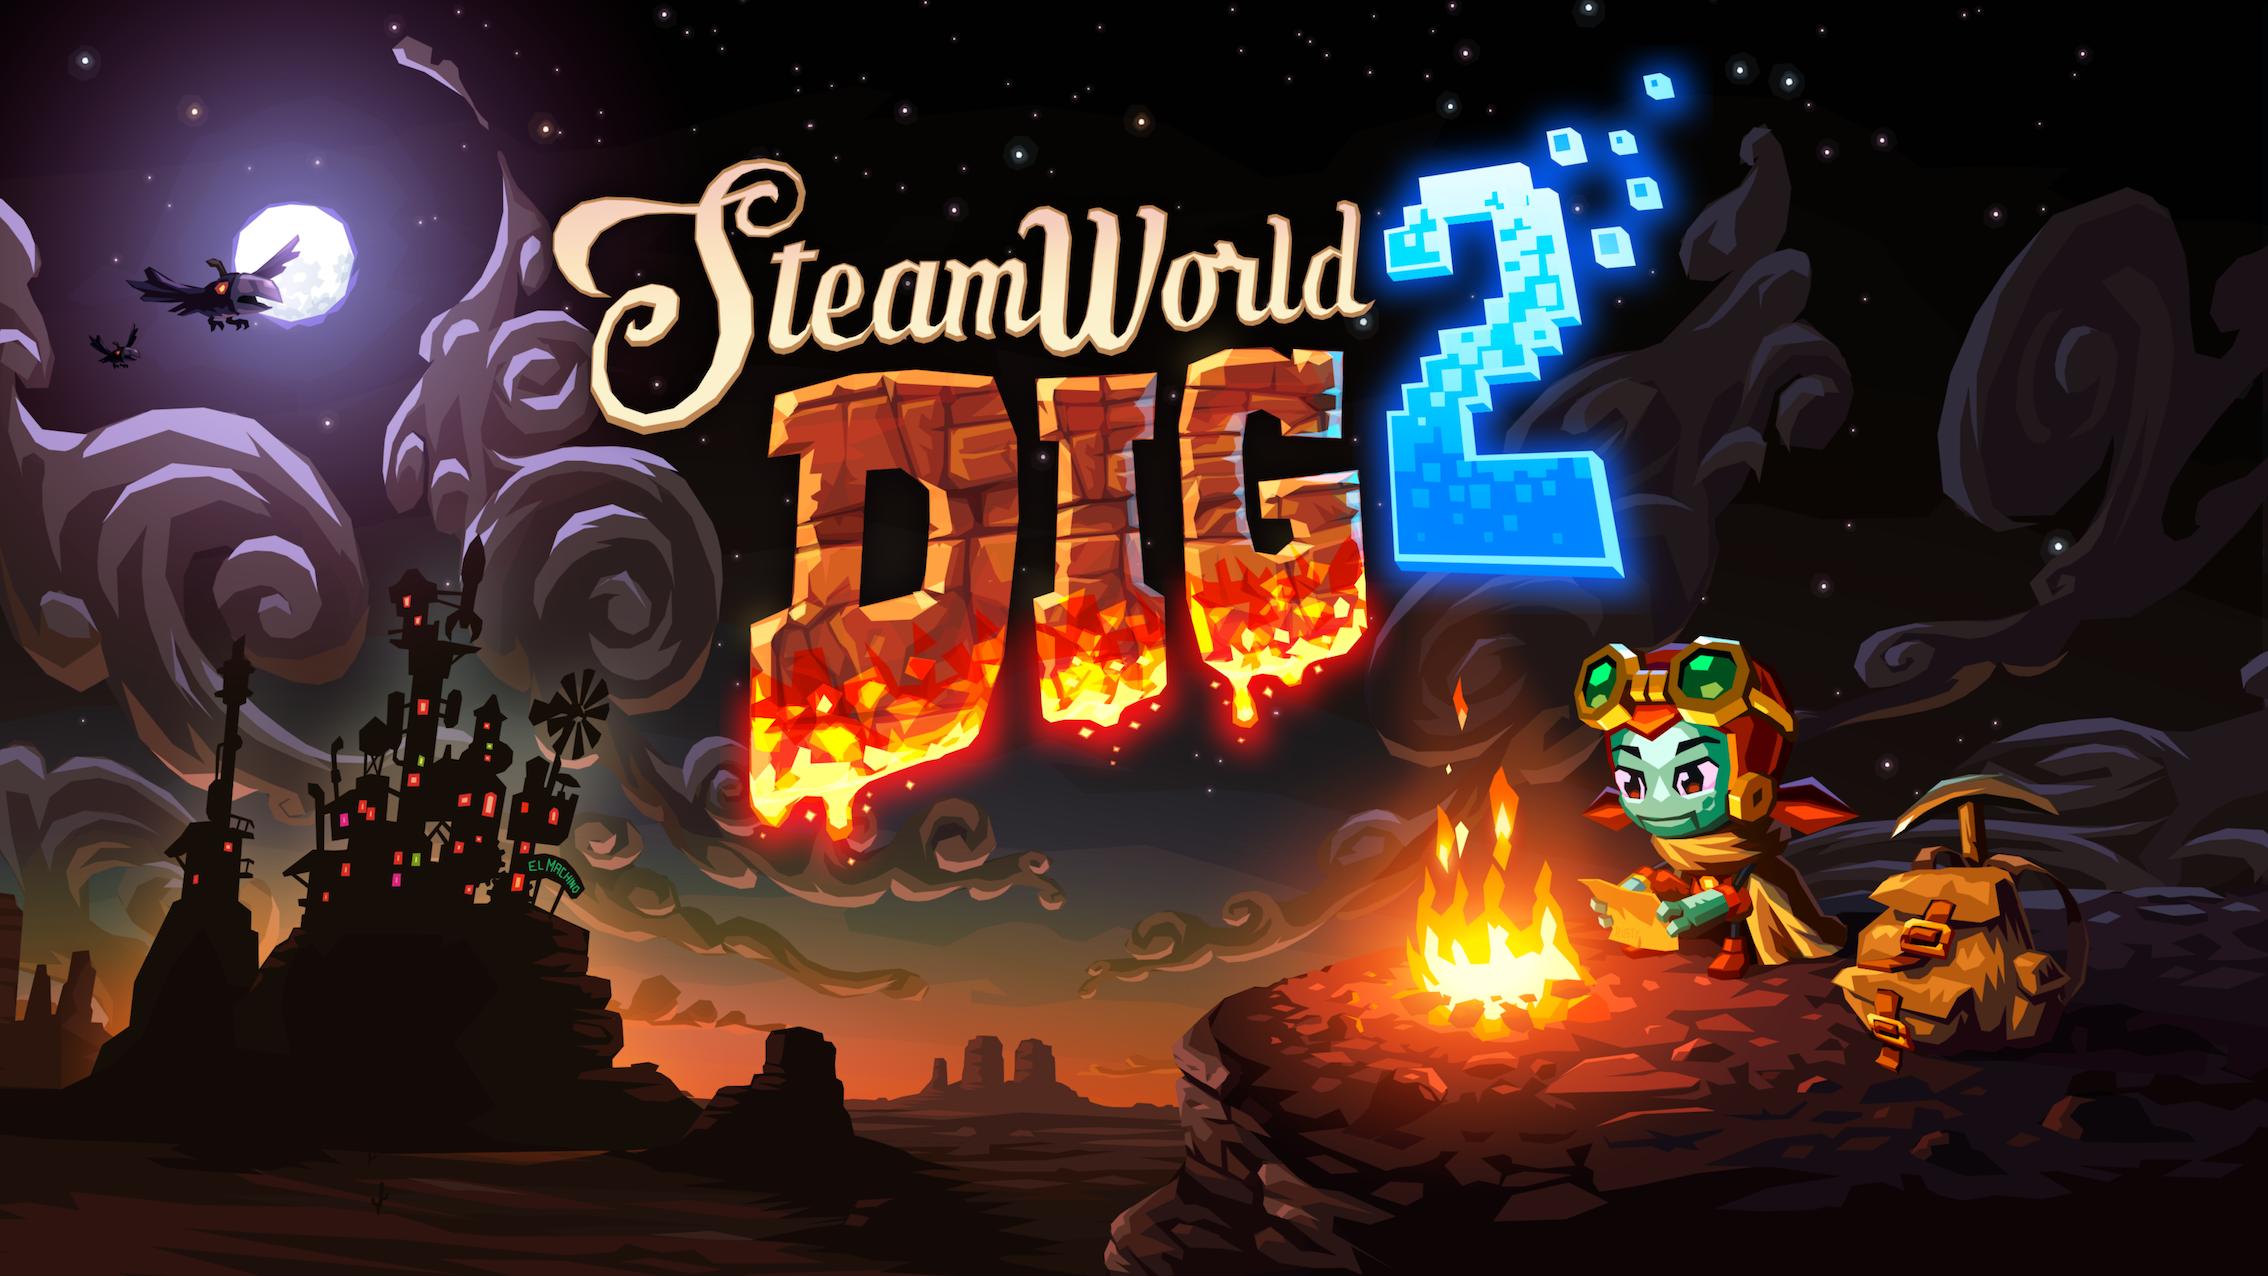 Subterranean metroidvania Steamworld Dig 2 burrows onto Nintendo Switch next month